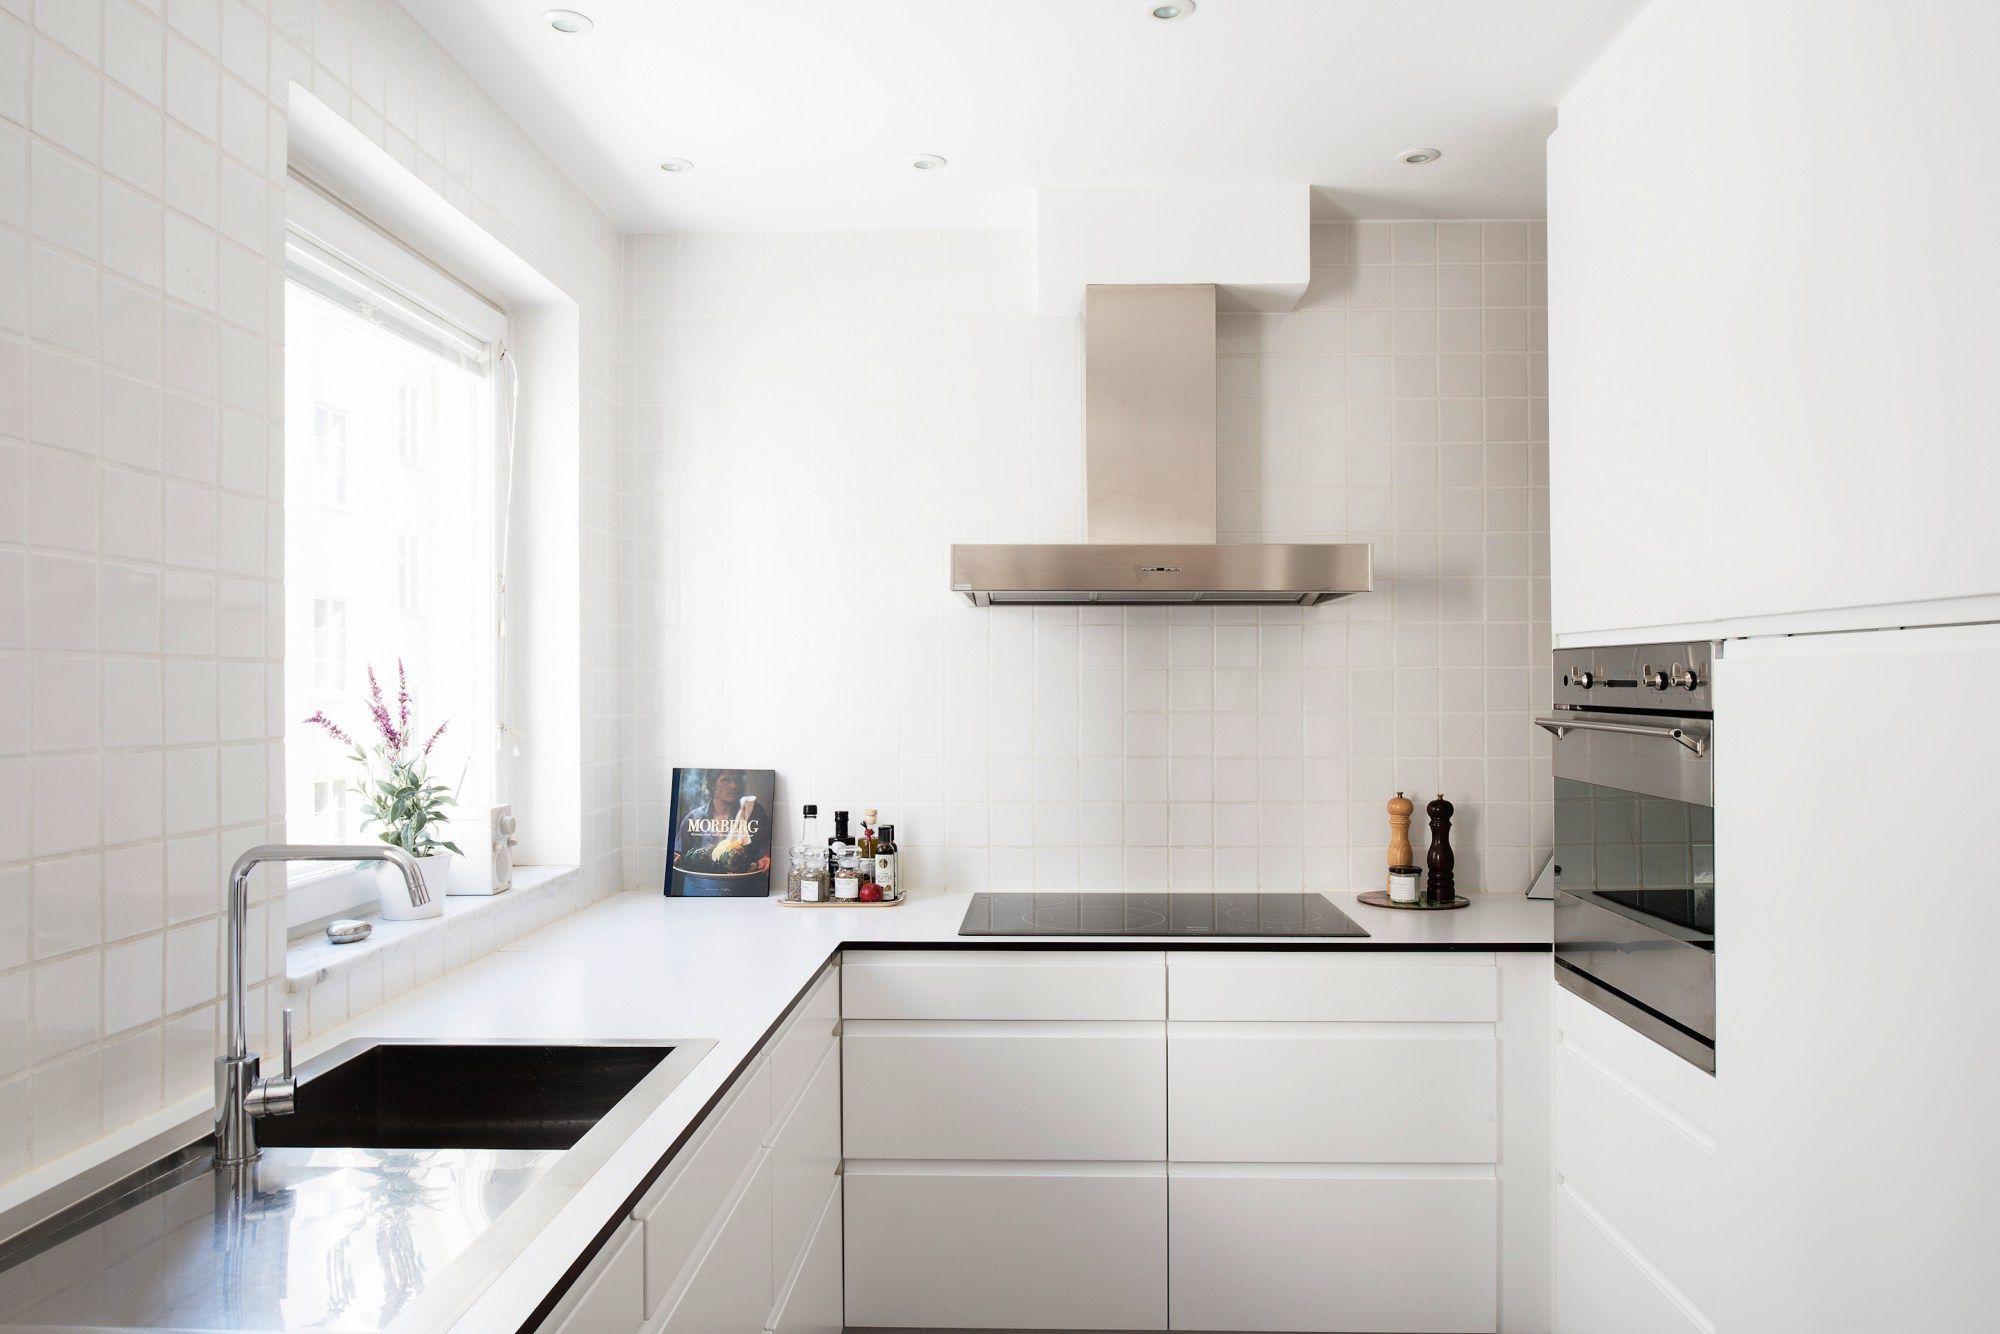 estilo nrdico escandinavo decoracin cocinas cocinas nrdicas cocinas modernas blancas cocina bien iluminada sin adornos blog - Cocinas Modernas Blancas